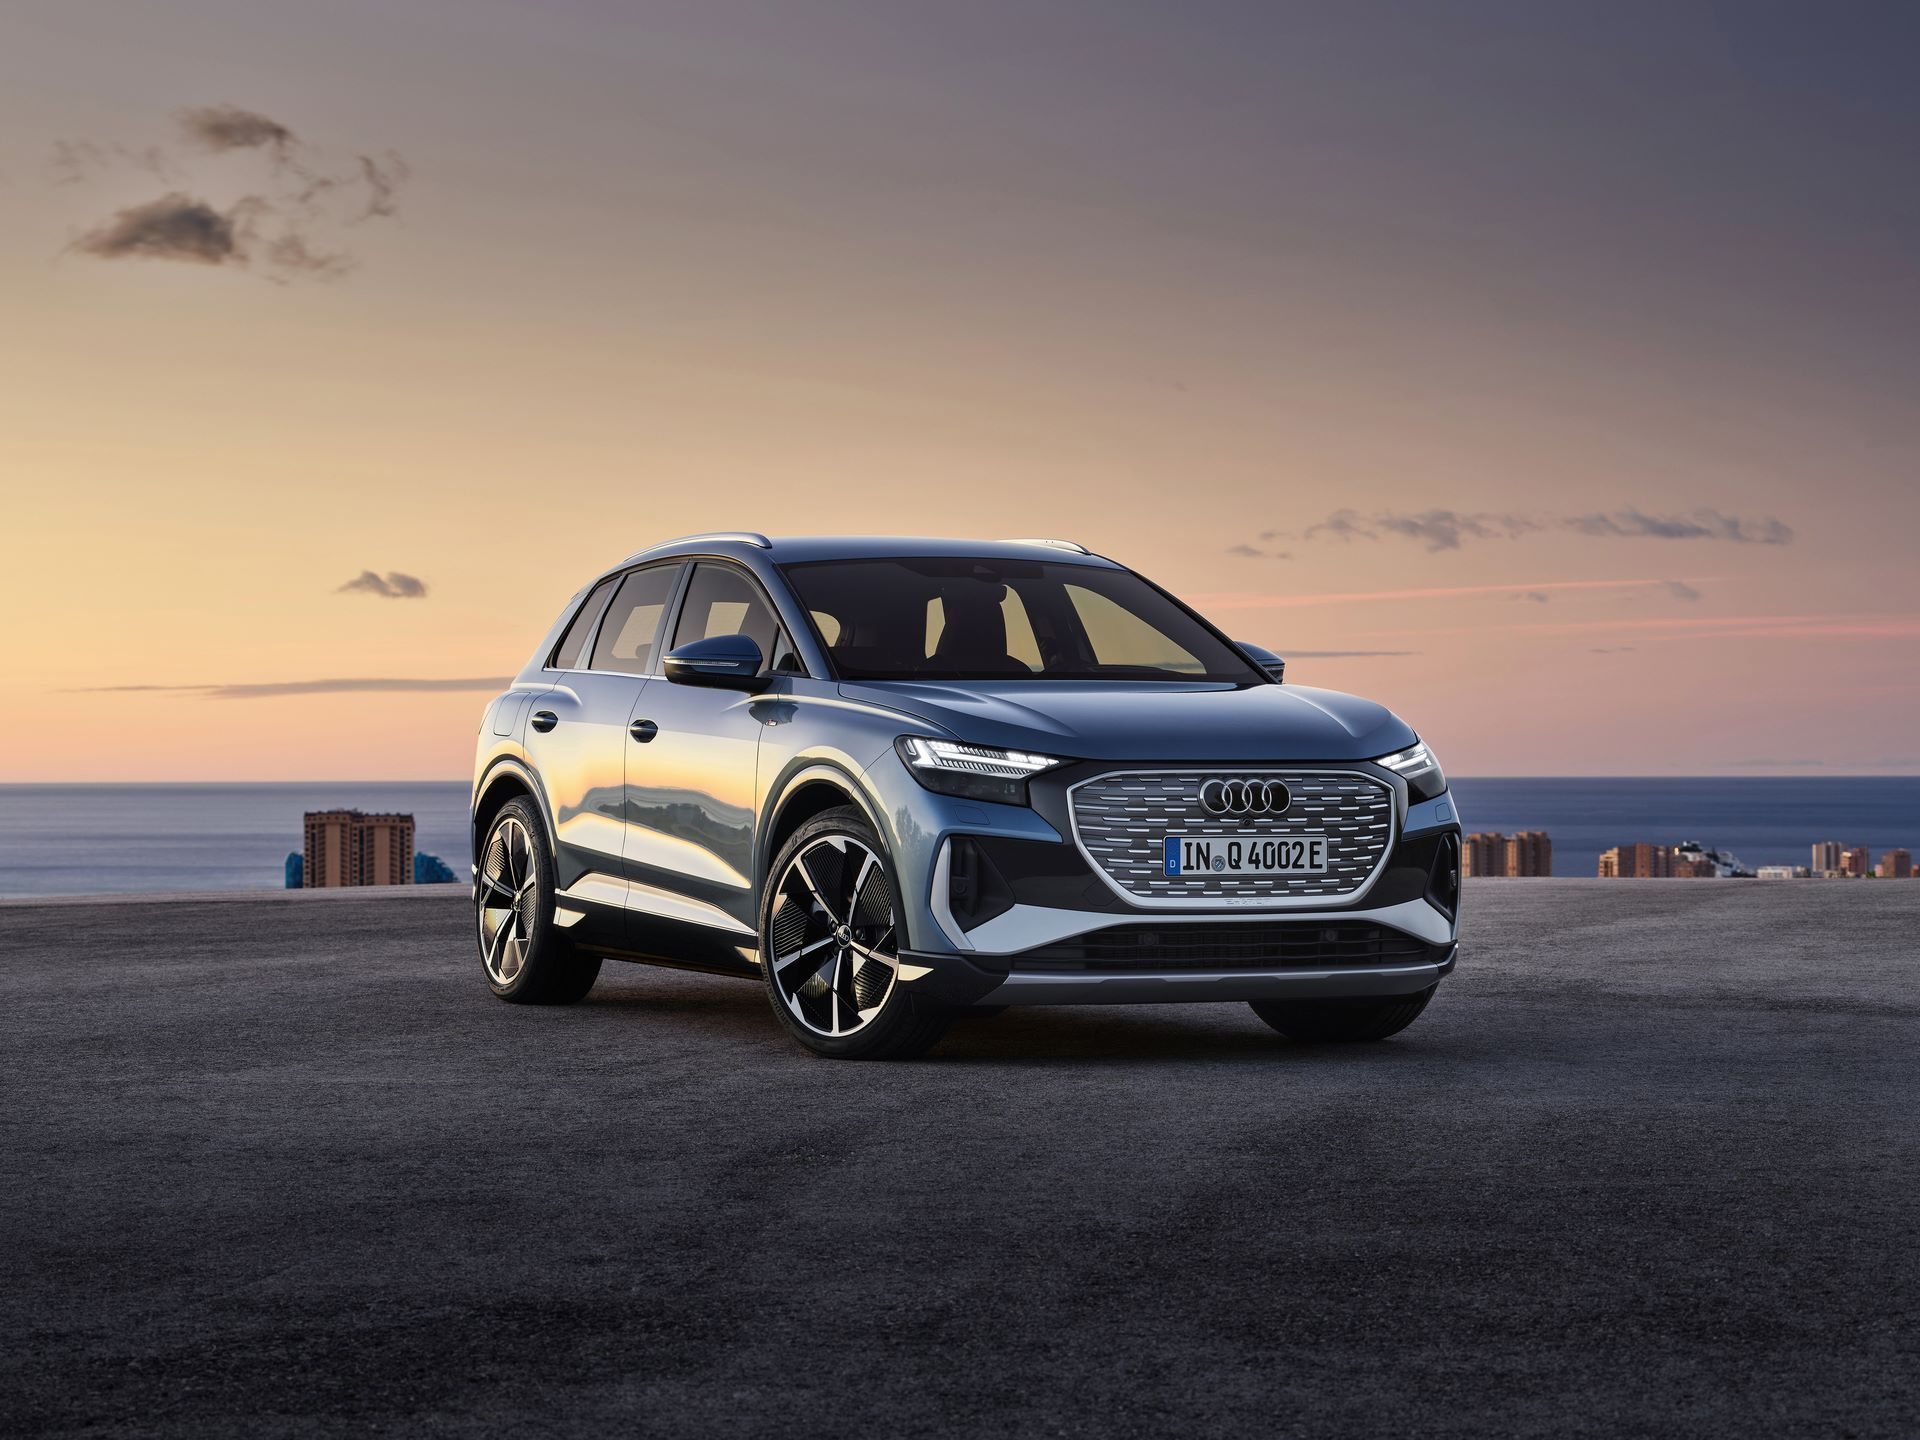 Audi-Q4-e-tron-and-Q4-e-tron-Sportback-53